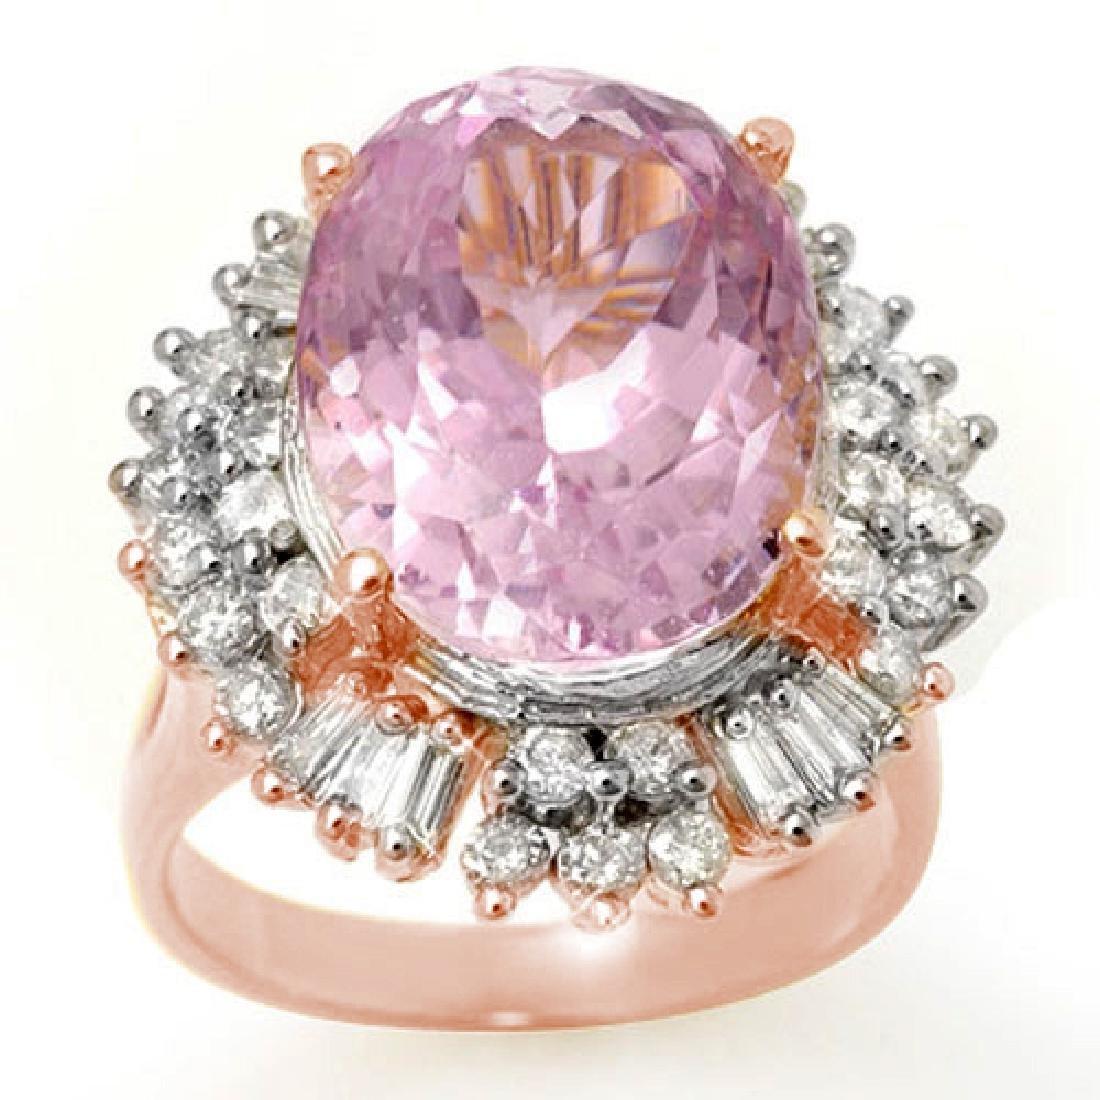 15.75 CTW Kunzite & Diamond Ring 14K Rose Gold